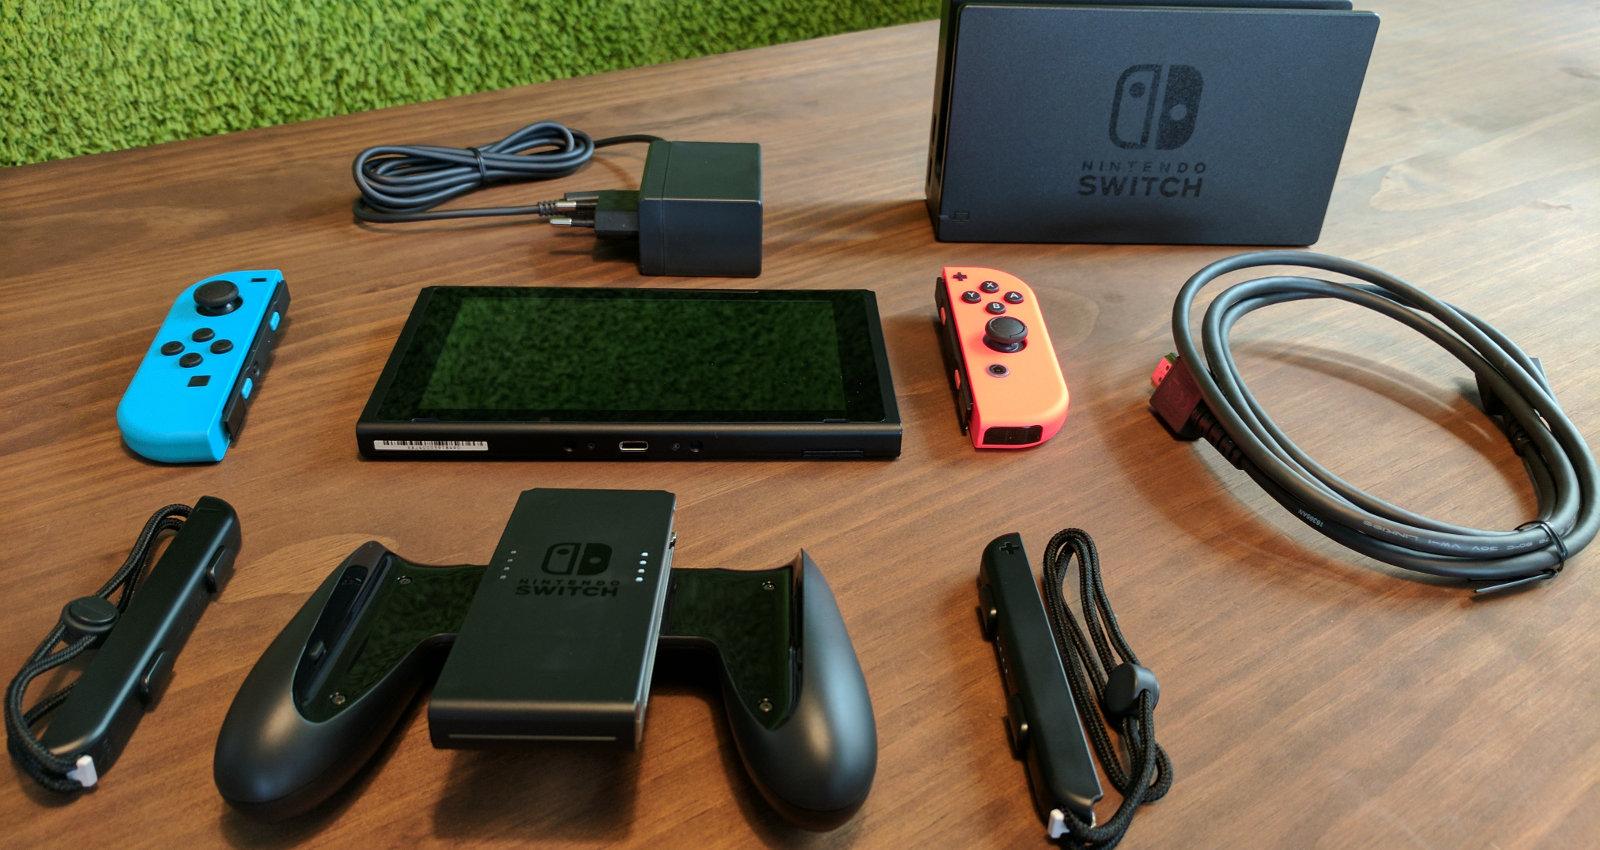 Nintendo Switch Inhalt des Kartons